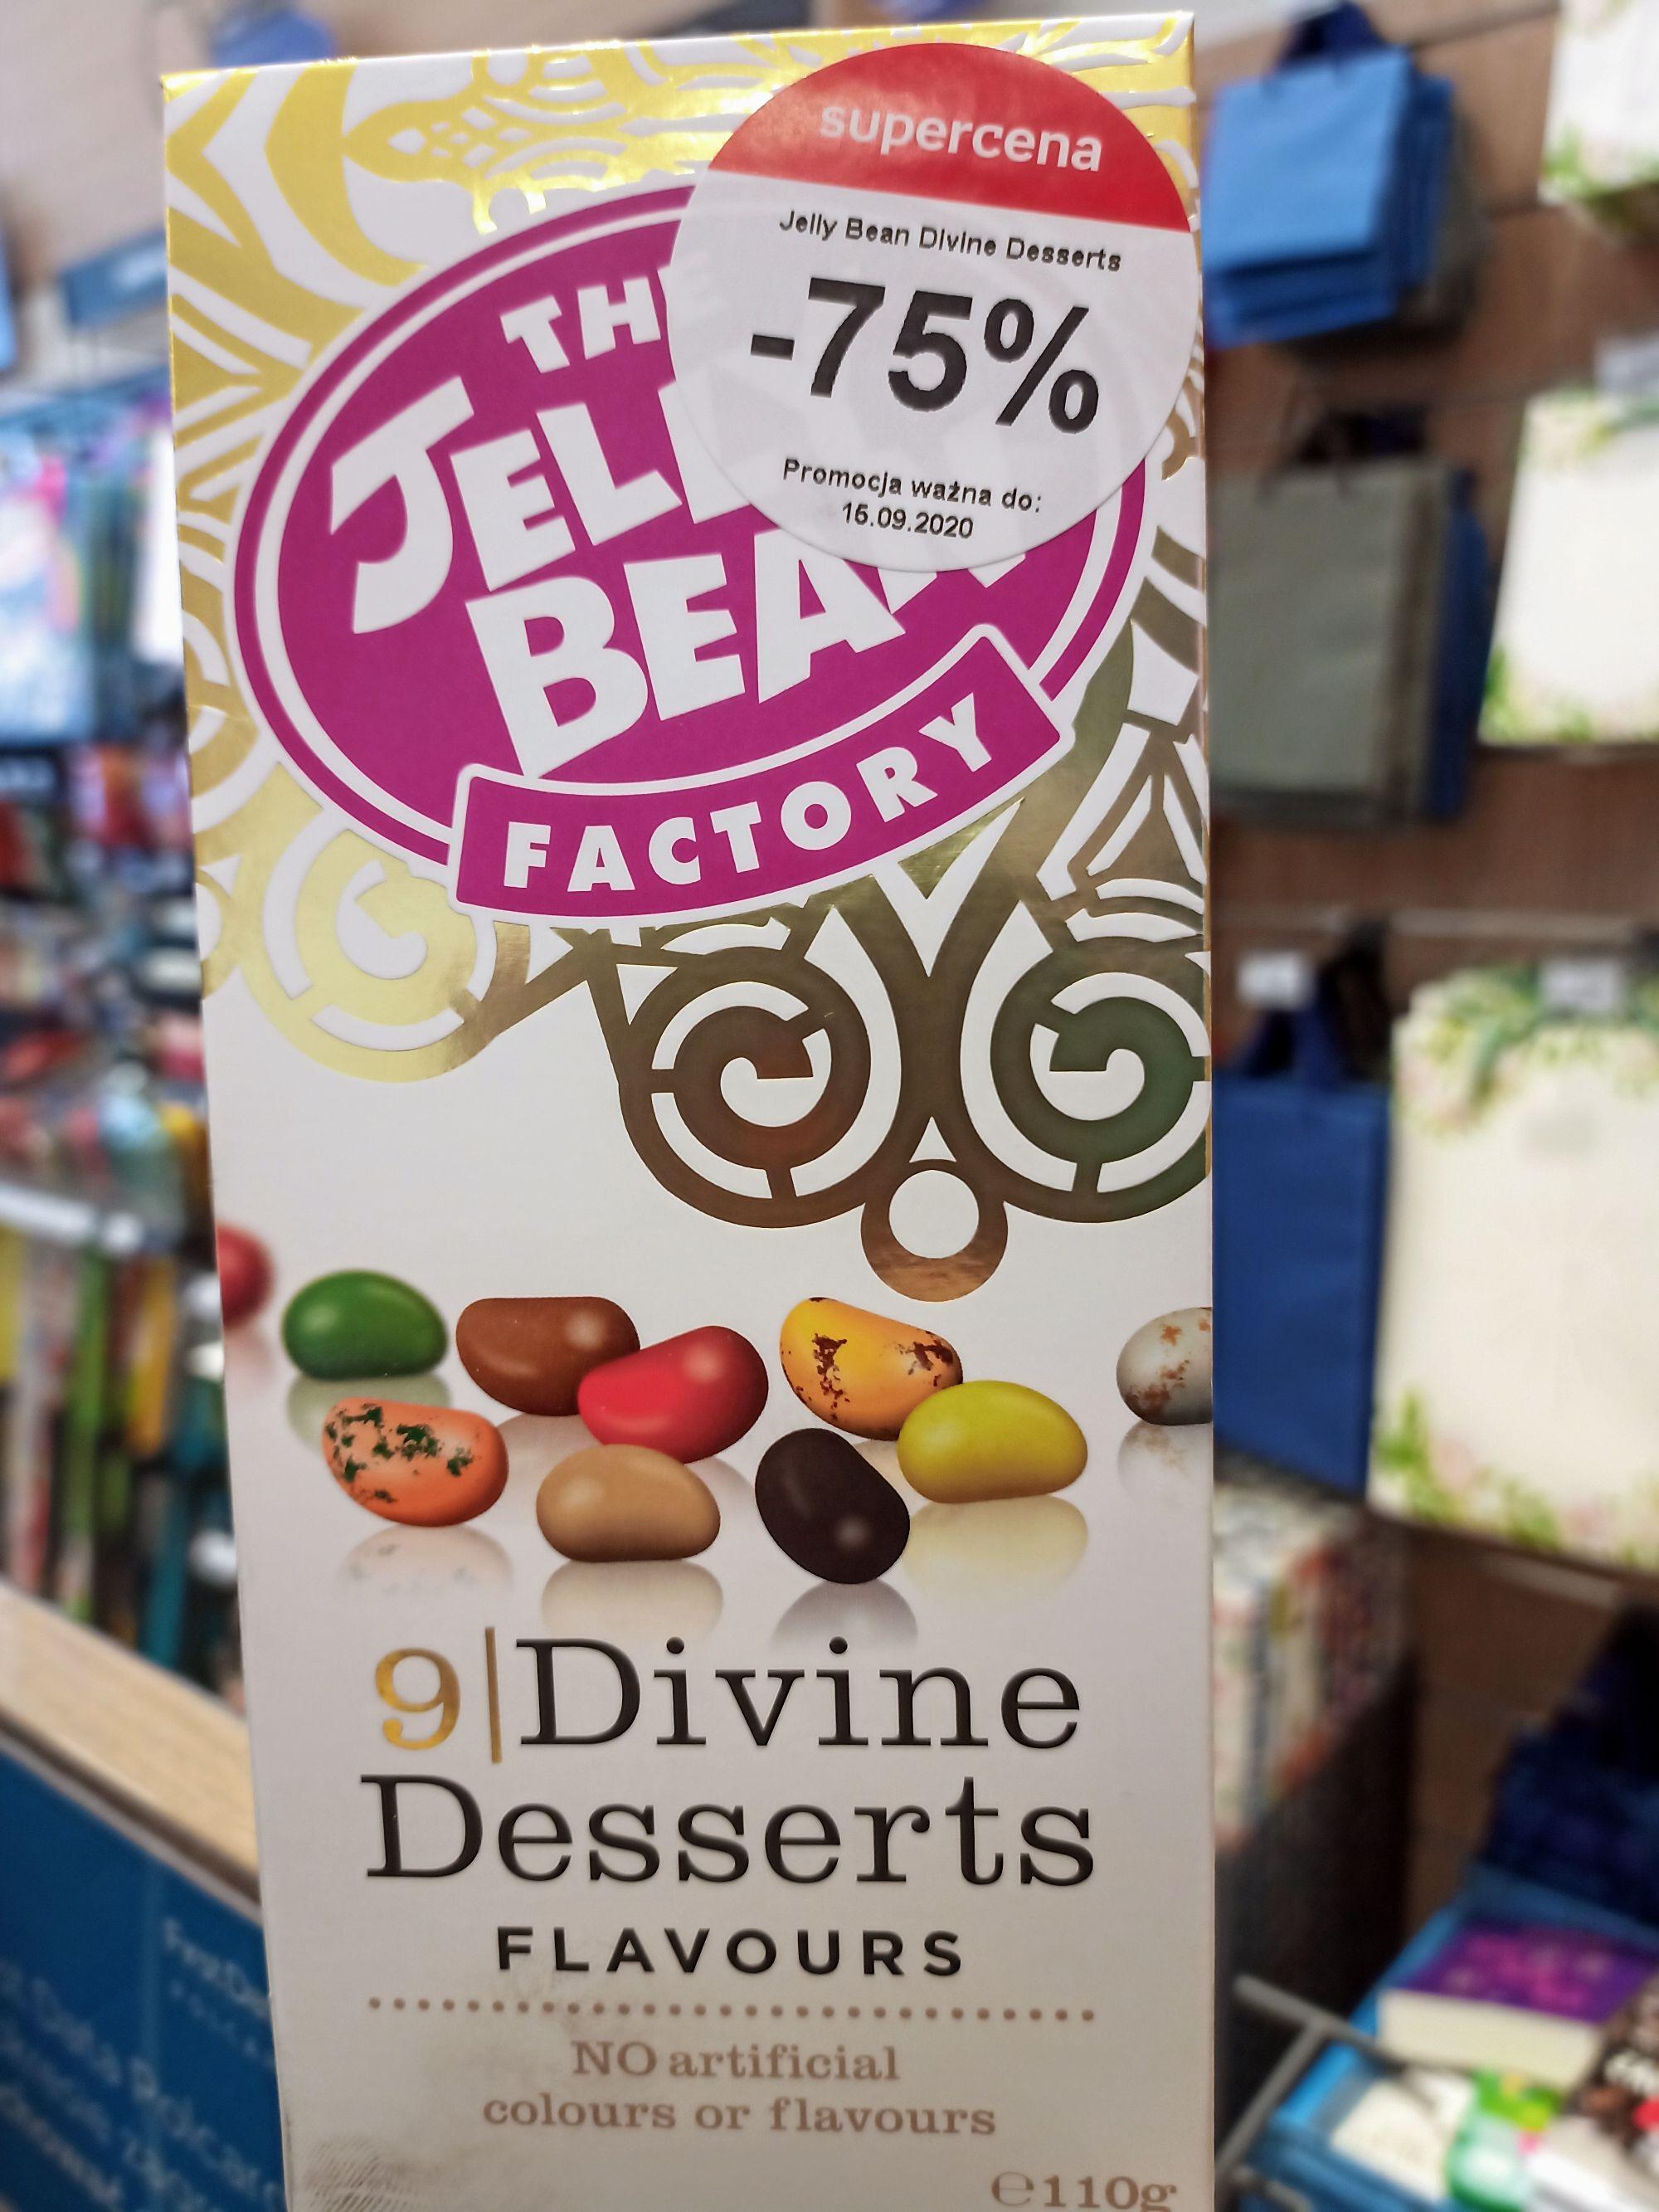 Jelly Beans Divine Desserts -75% w Empik